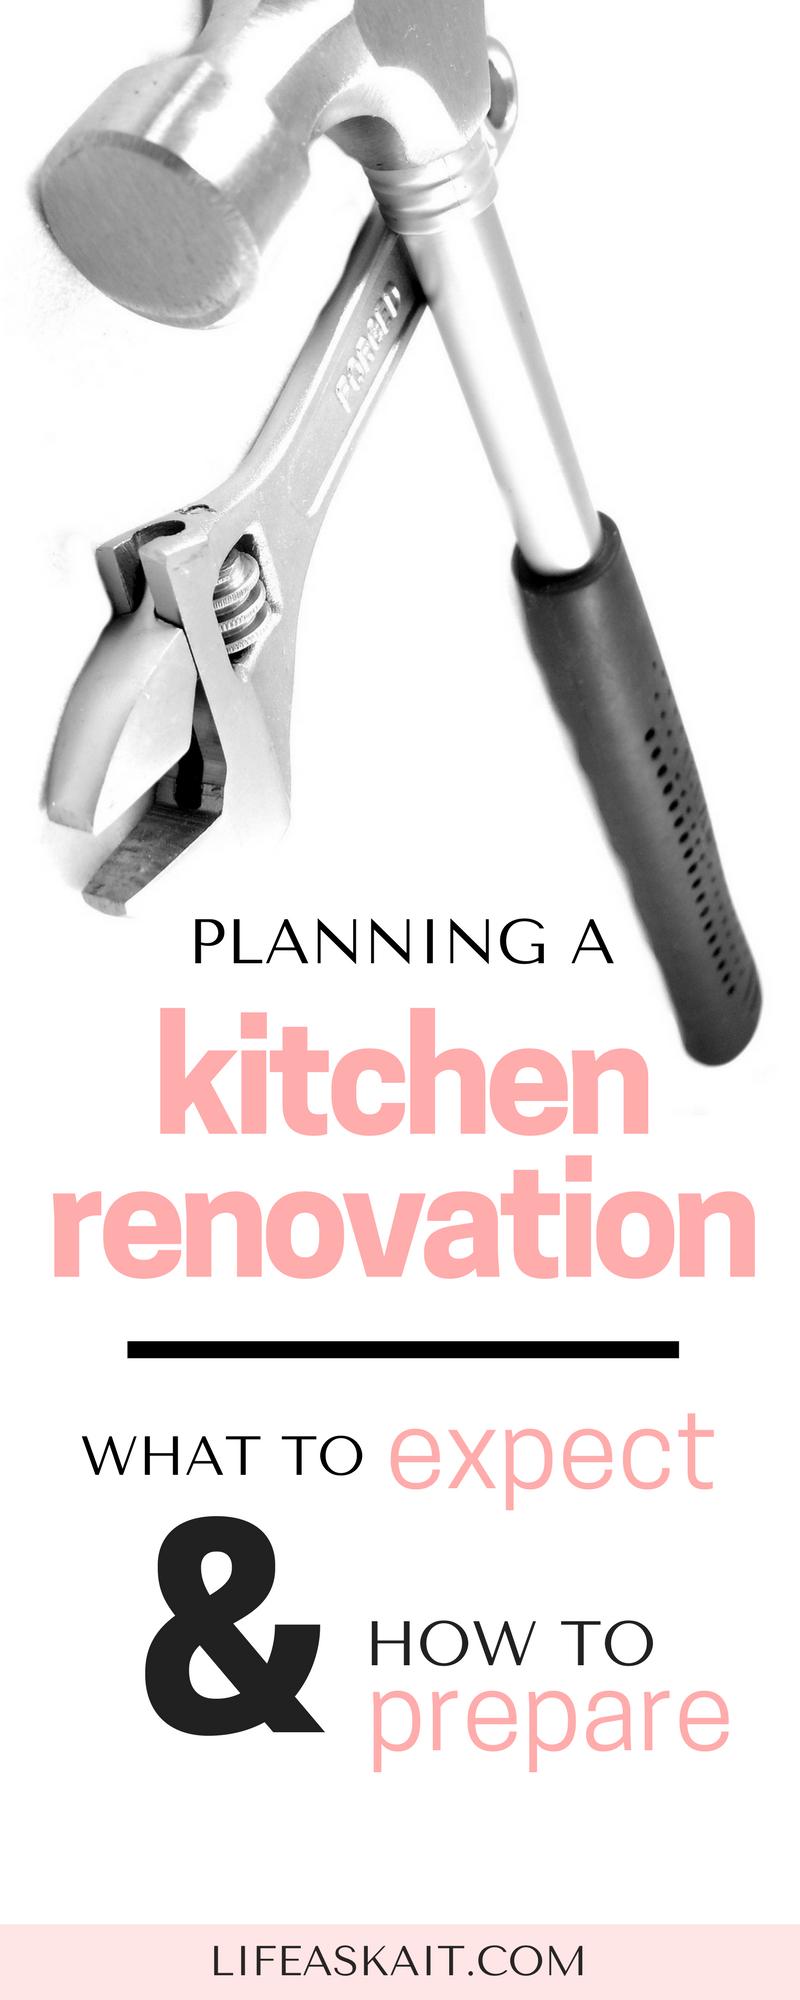 Kitchen cabinets at reno depot - Kitchen Renovation Kitchen Reno Home Renovation Home Reno Housework How To Buy Kitchen Cabinets Home Depot Cabinets How To Plan A Kitchen Renovation